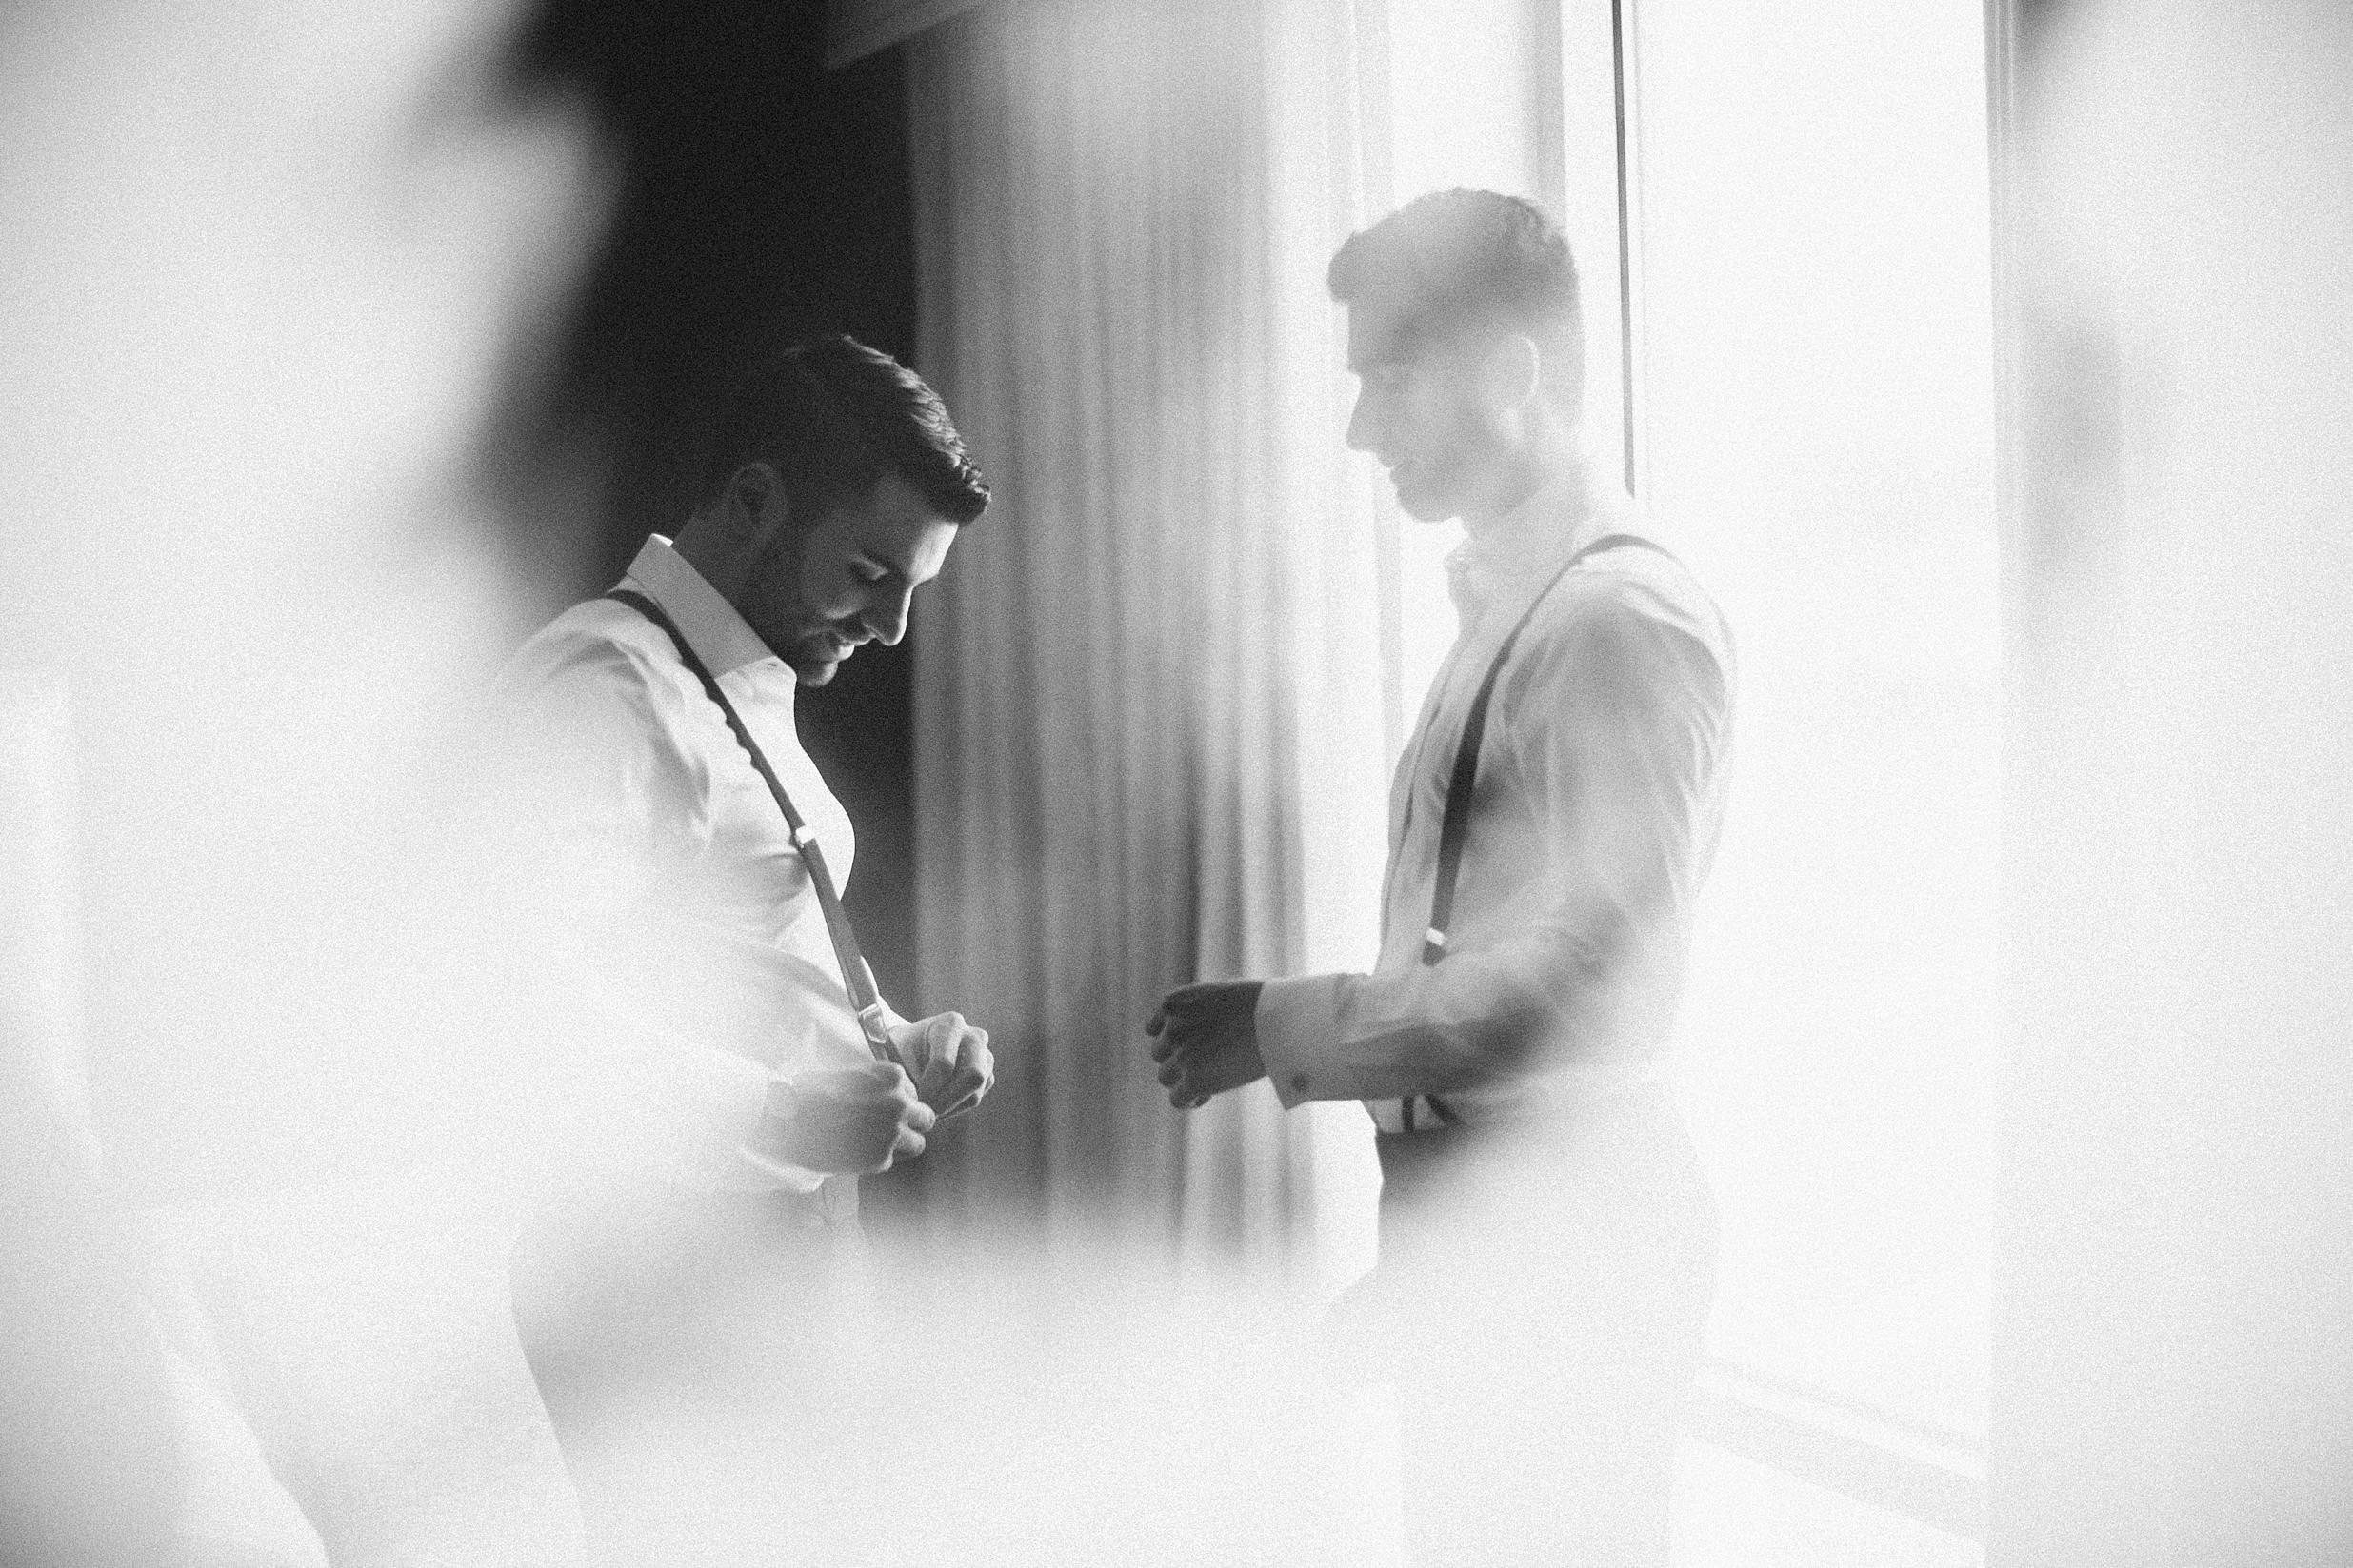 winter-wedding-snow-indoor-ceremony-nj-photographer_0003.jpg